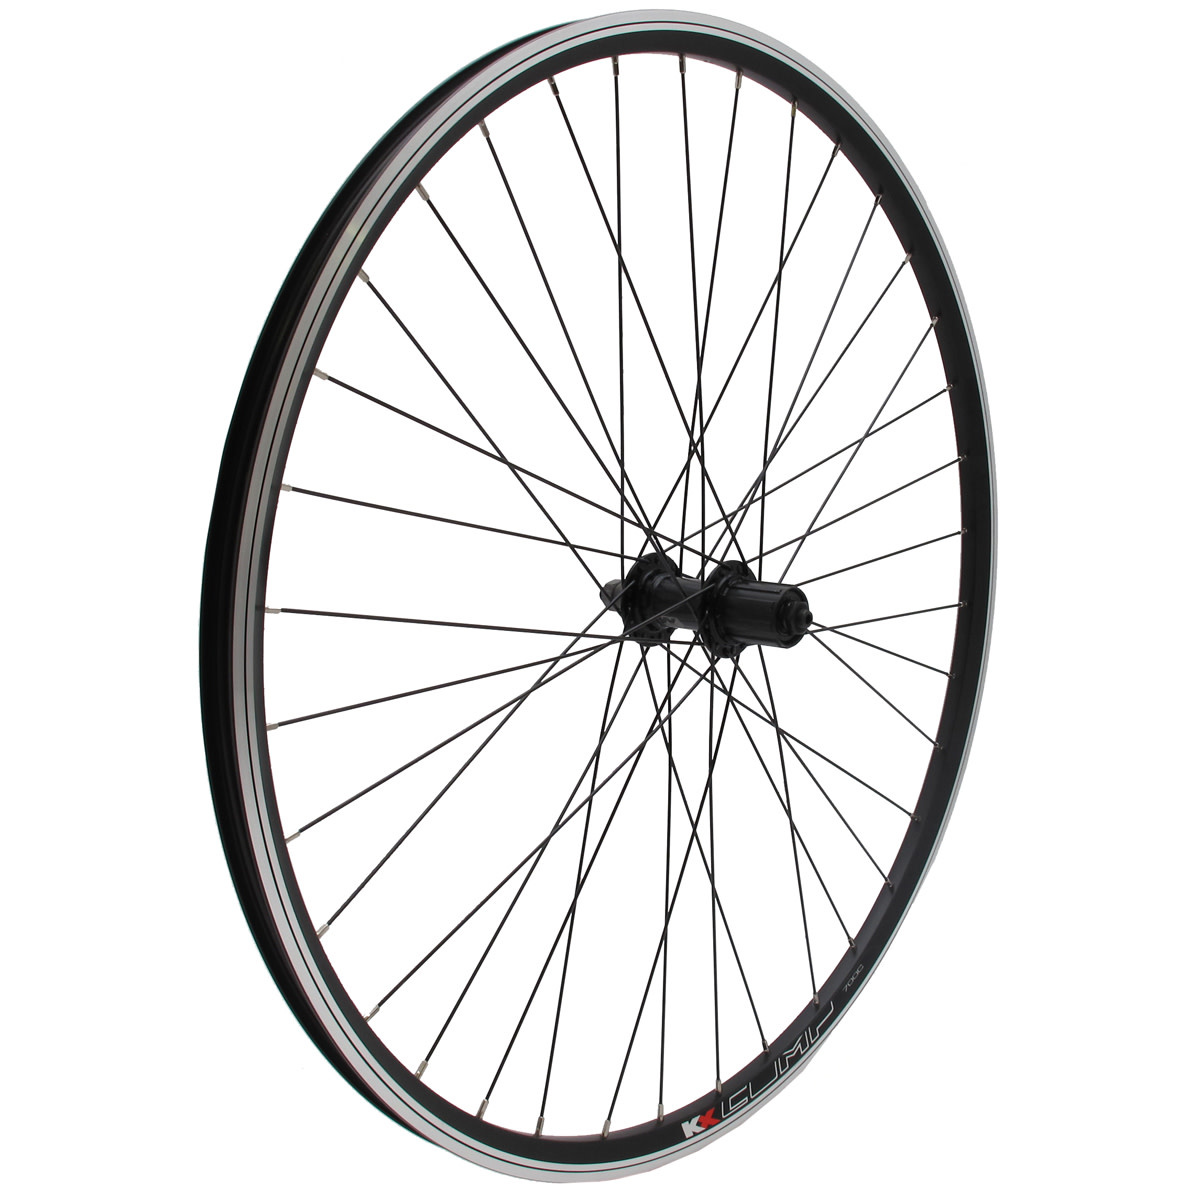 KX wheels KX Hybrid 700C Singlewall Q/R Screw On Wheel Rim Brake (Rear) - Black